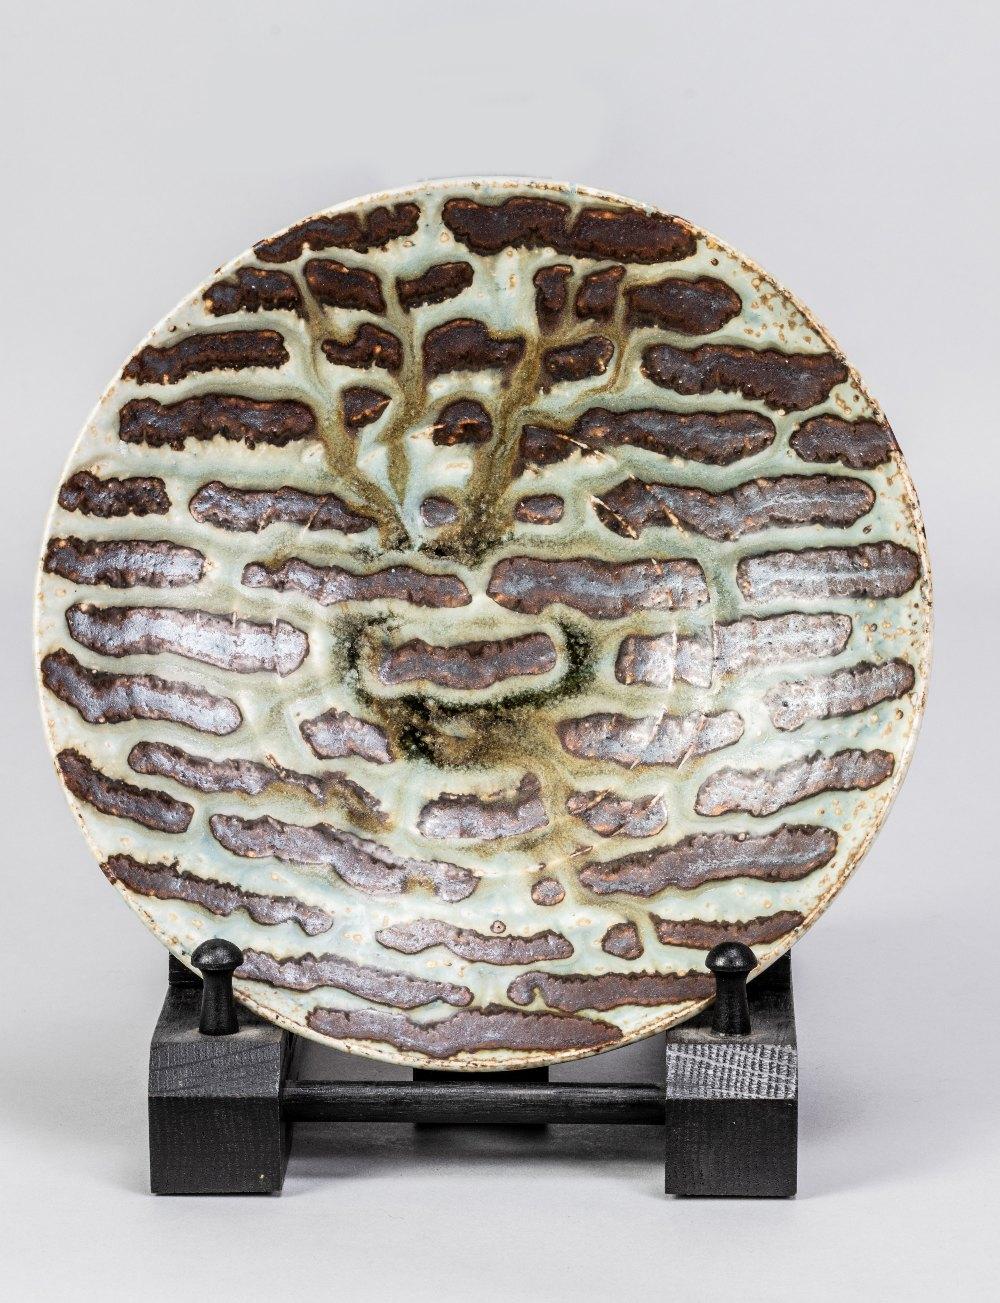 DEREK DAVIS (1926-2008); a porcelain dish covered in running green glaze on iron rich ground, - Image 3 of 5